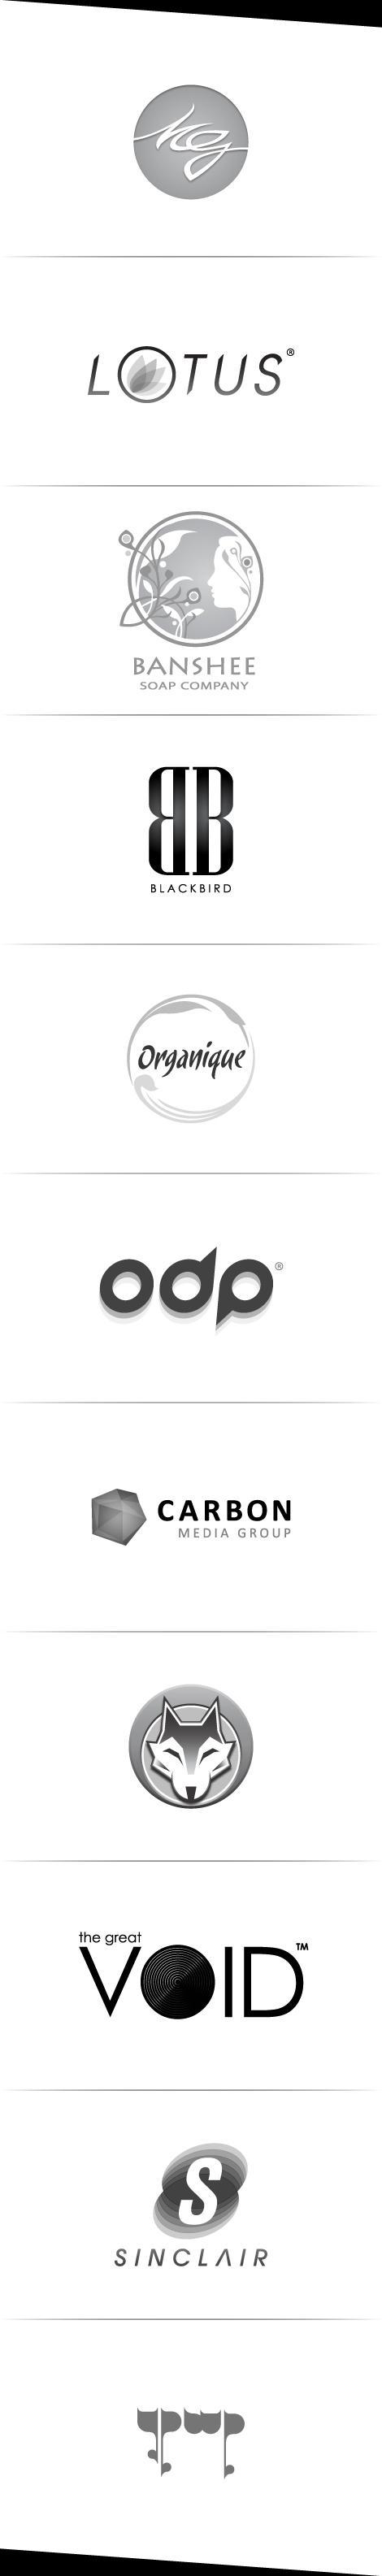 Logotype / Identity Works 08-10